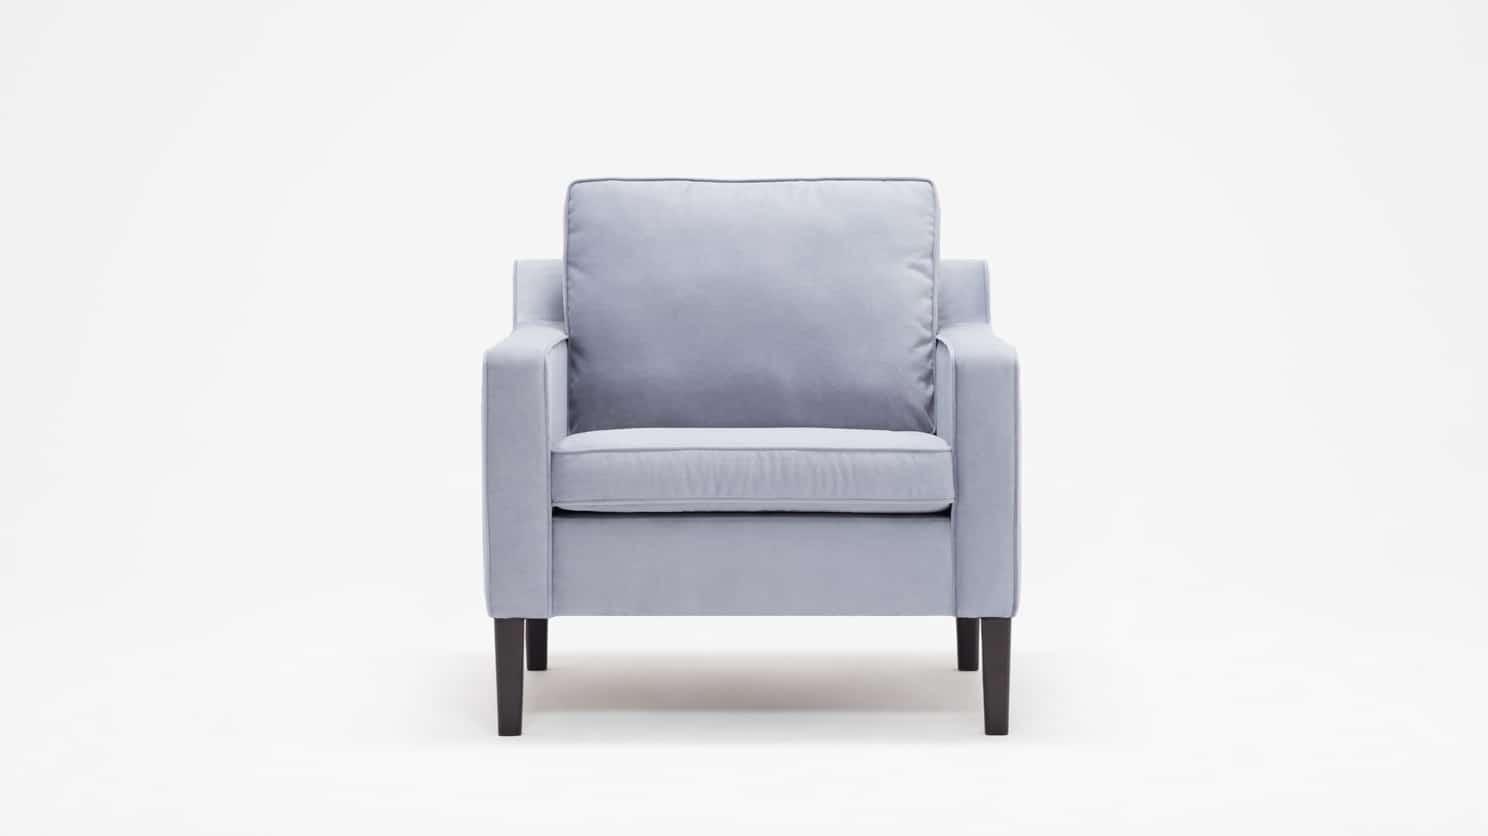 skye chair urban slate front 02